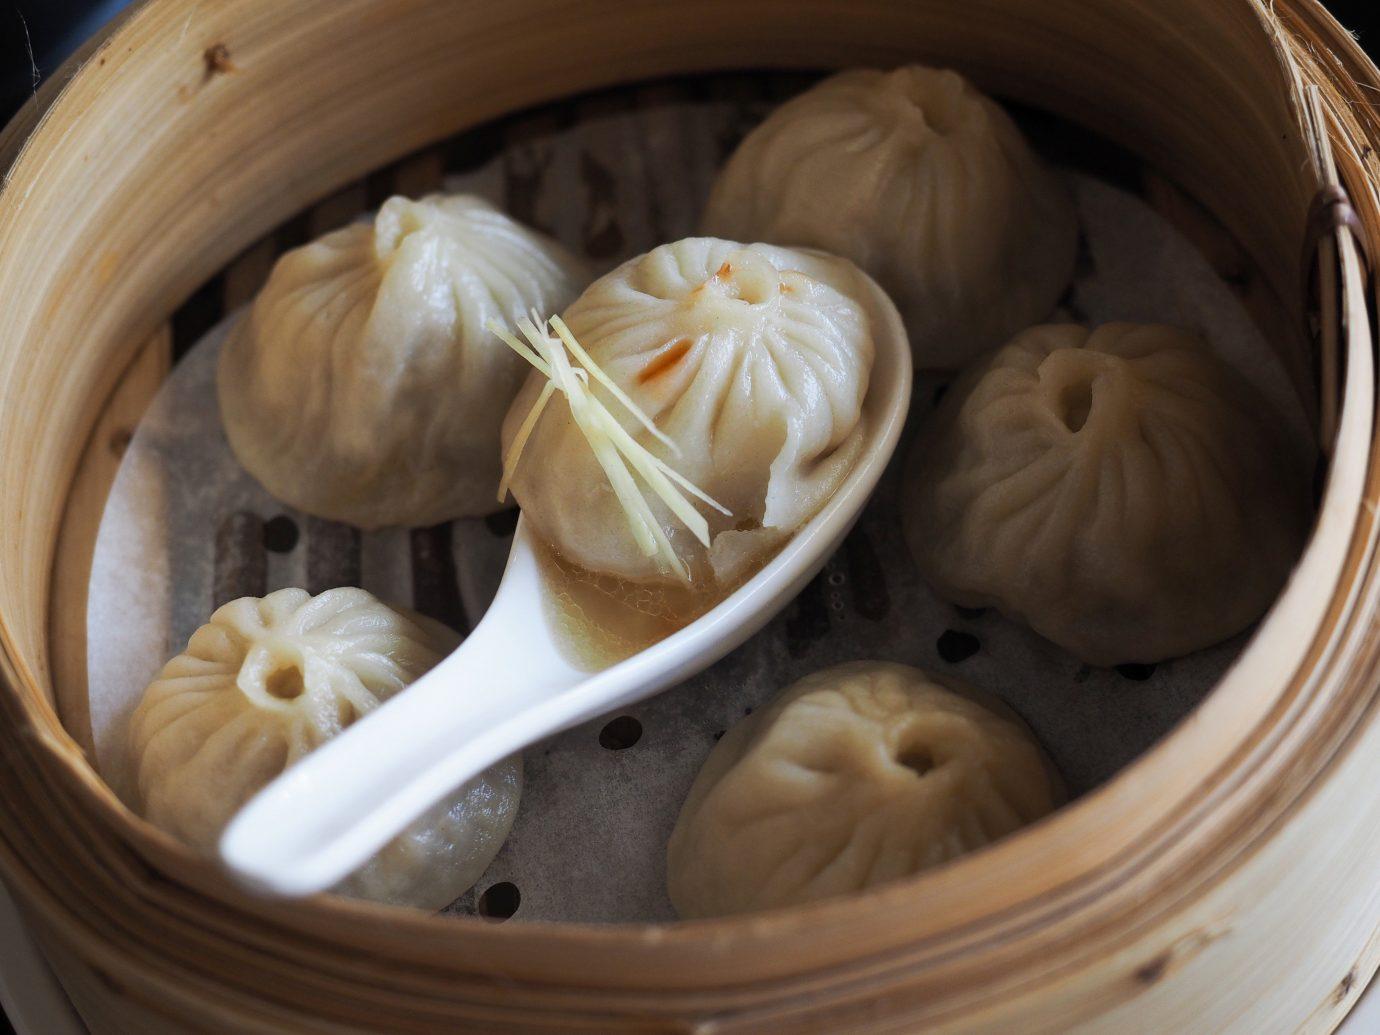 Trip Ideas xiaolongbao dish momo dumpling dim sum food chinese food cuisine baozi mongolian food dim sim buuz asian food mandu tibetan food